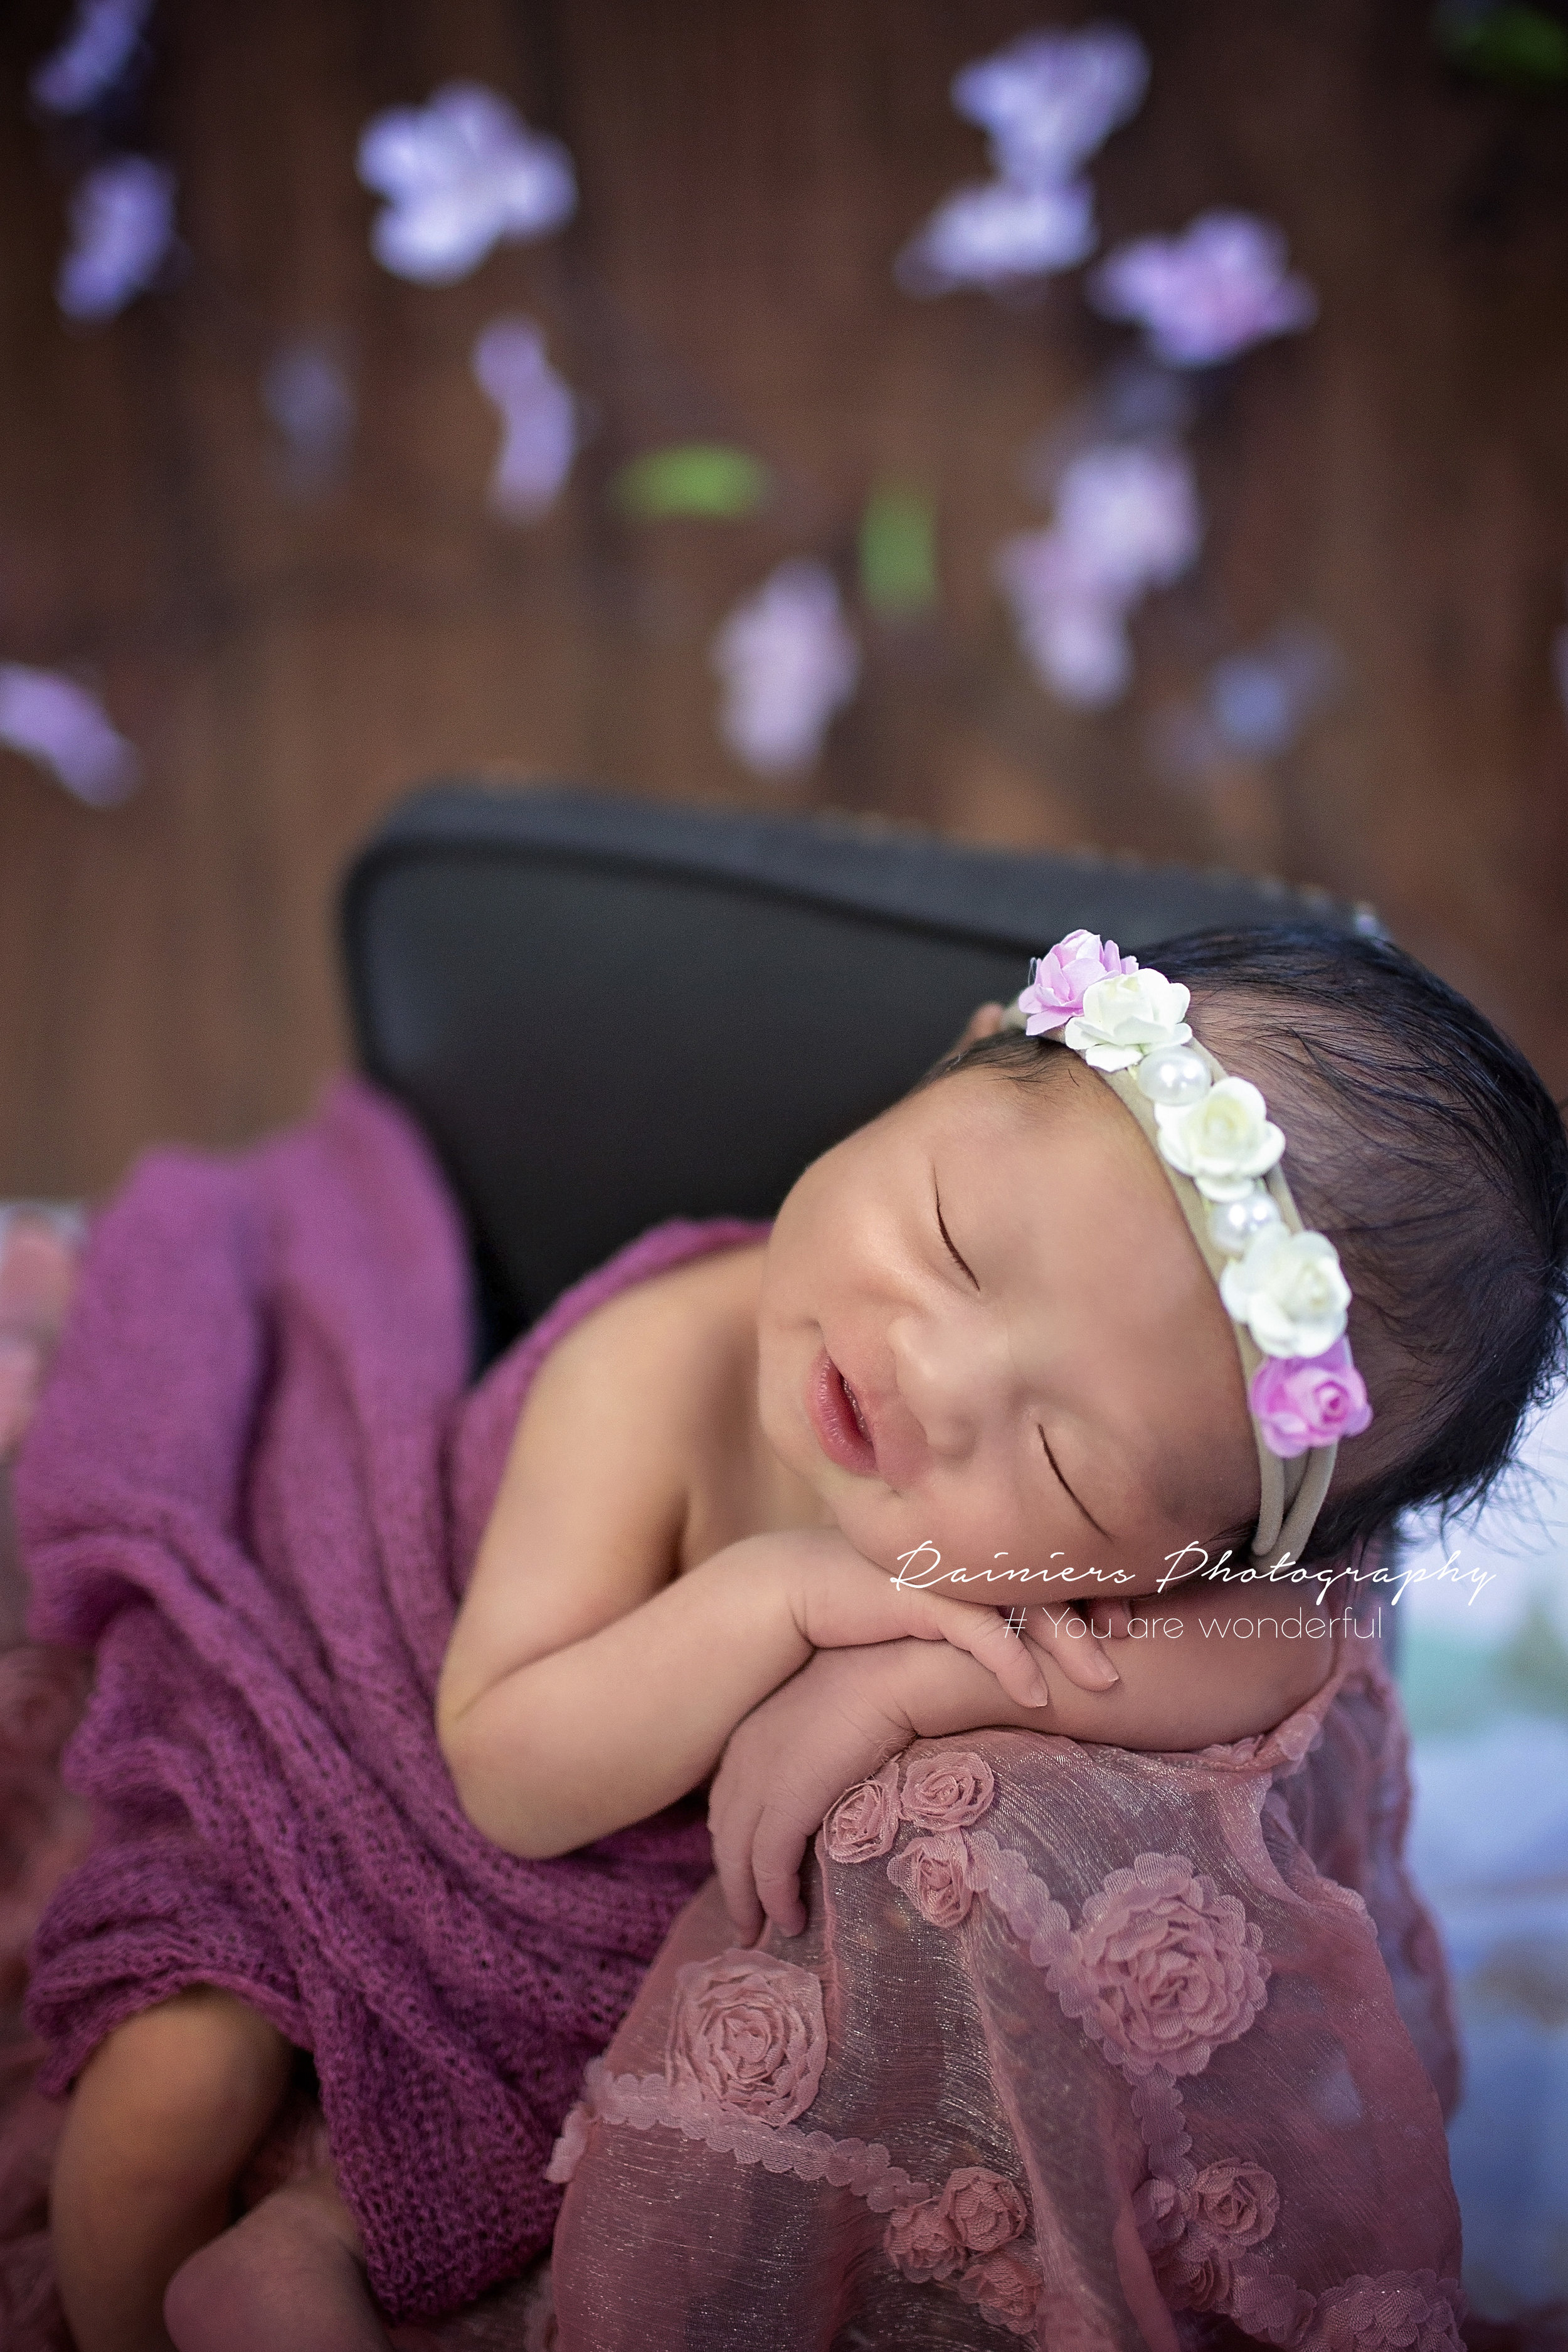 Baby Ava-01.jpg